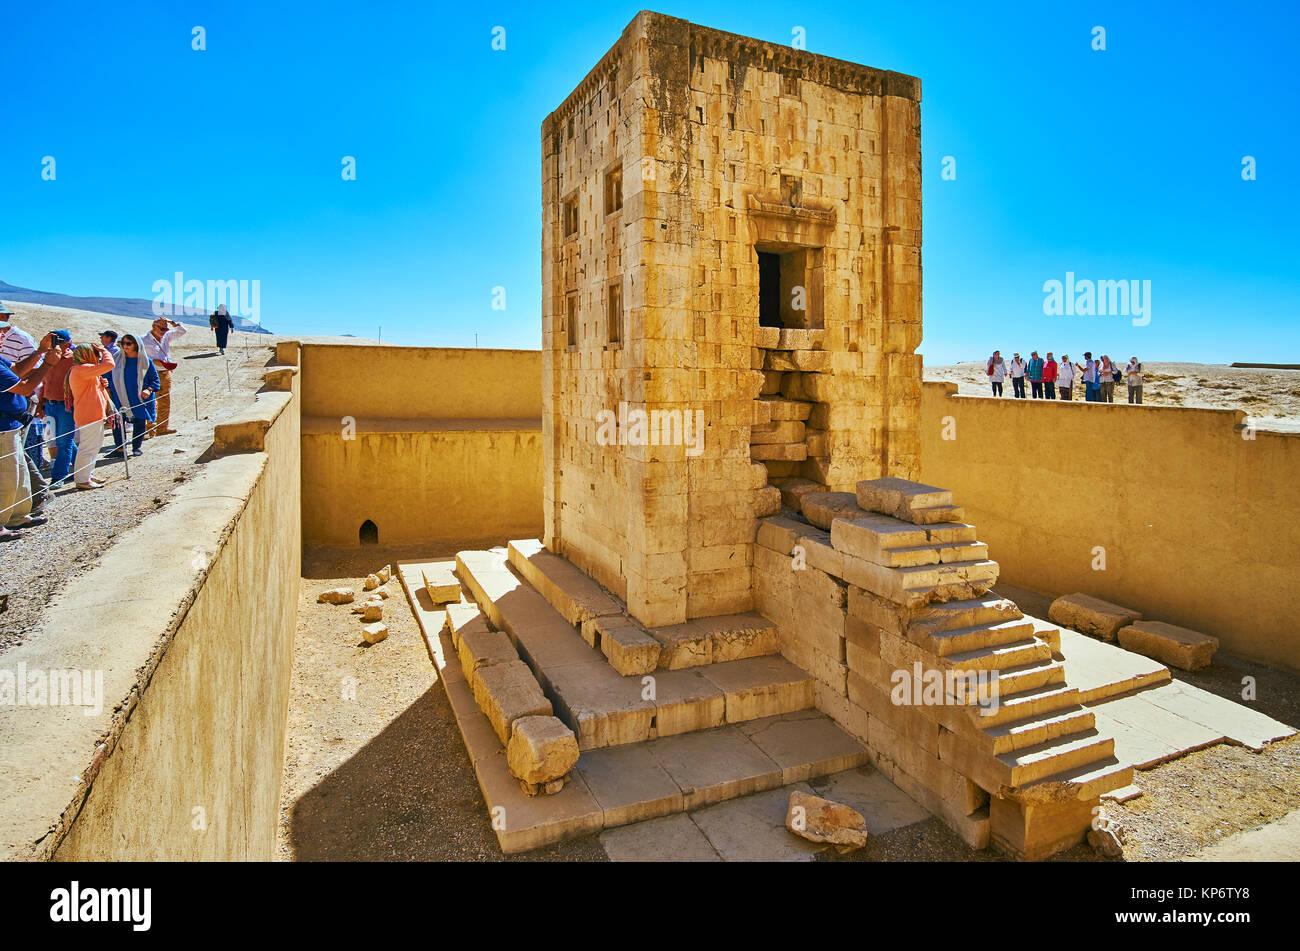 NAQSH-E RUSTAM, IRAN - OCTOBER 13, 2017: The ancient building of Ka'ba-ye Zartosht - Zoroaster tower or chamber - Stock Image